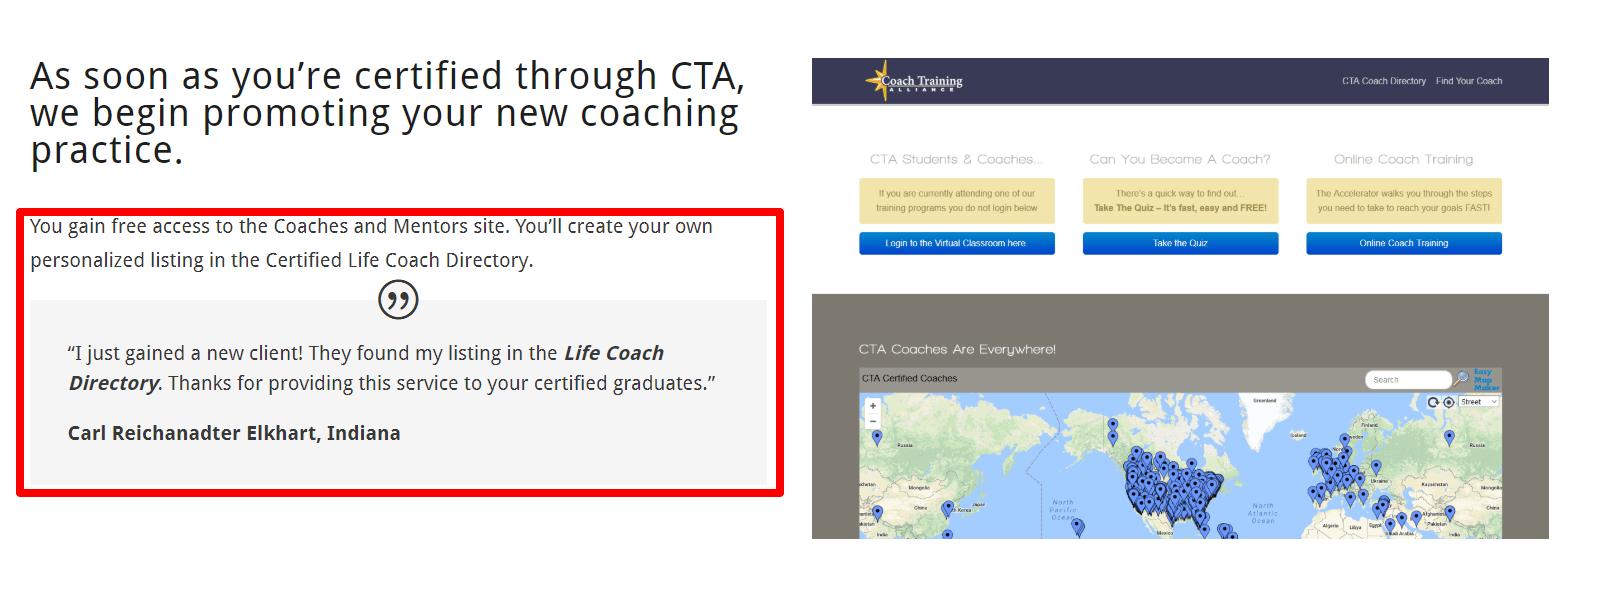 Coach Training Alliance Review- Certified Coach Program Reviews